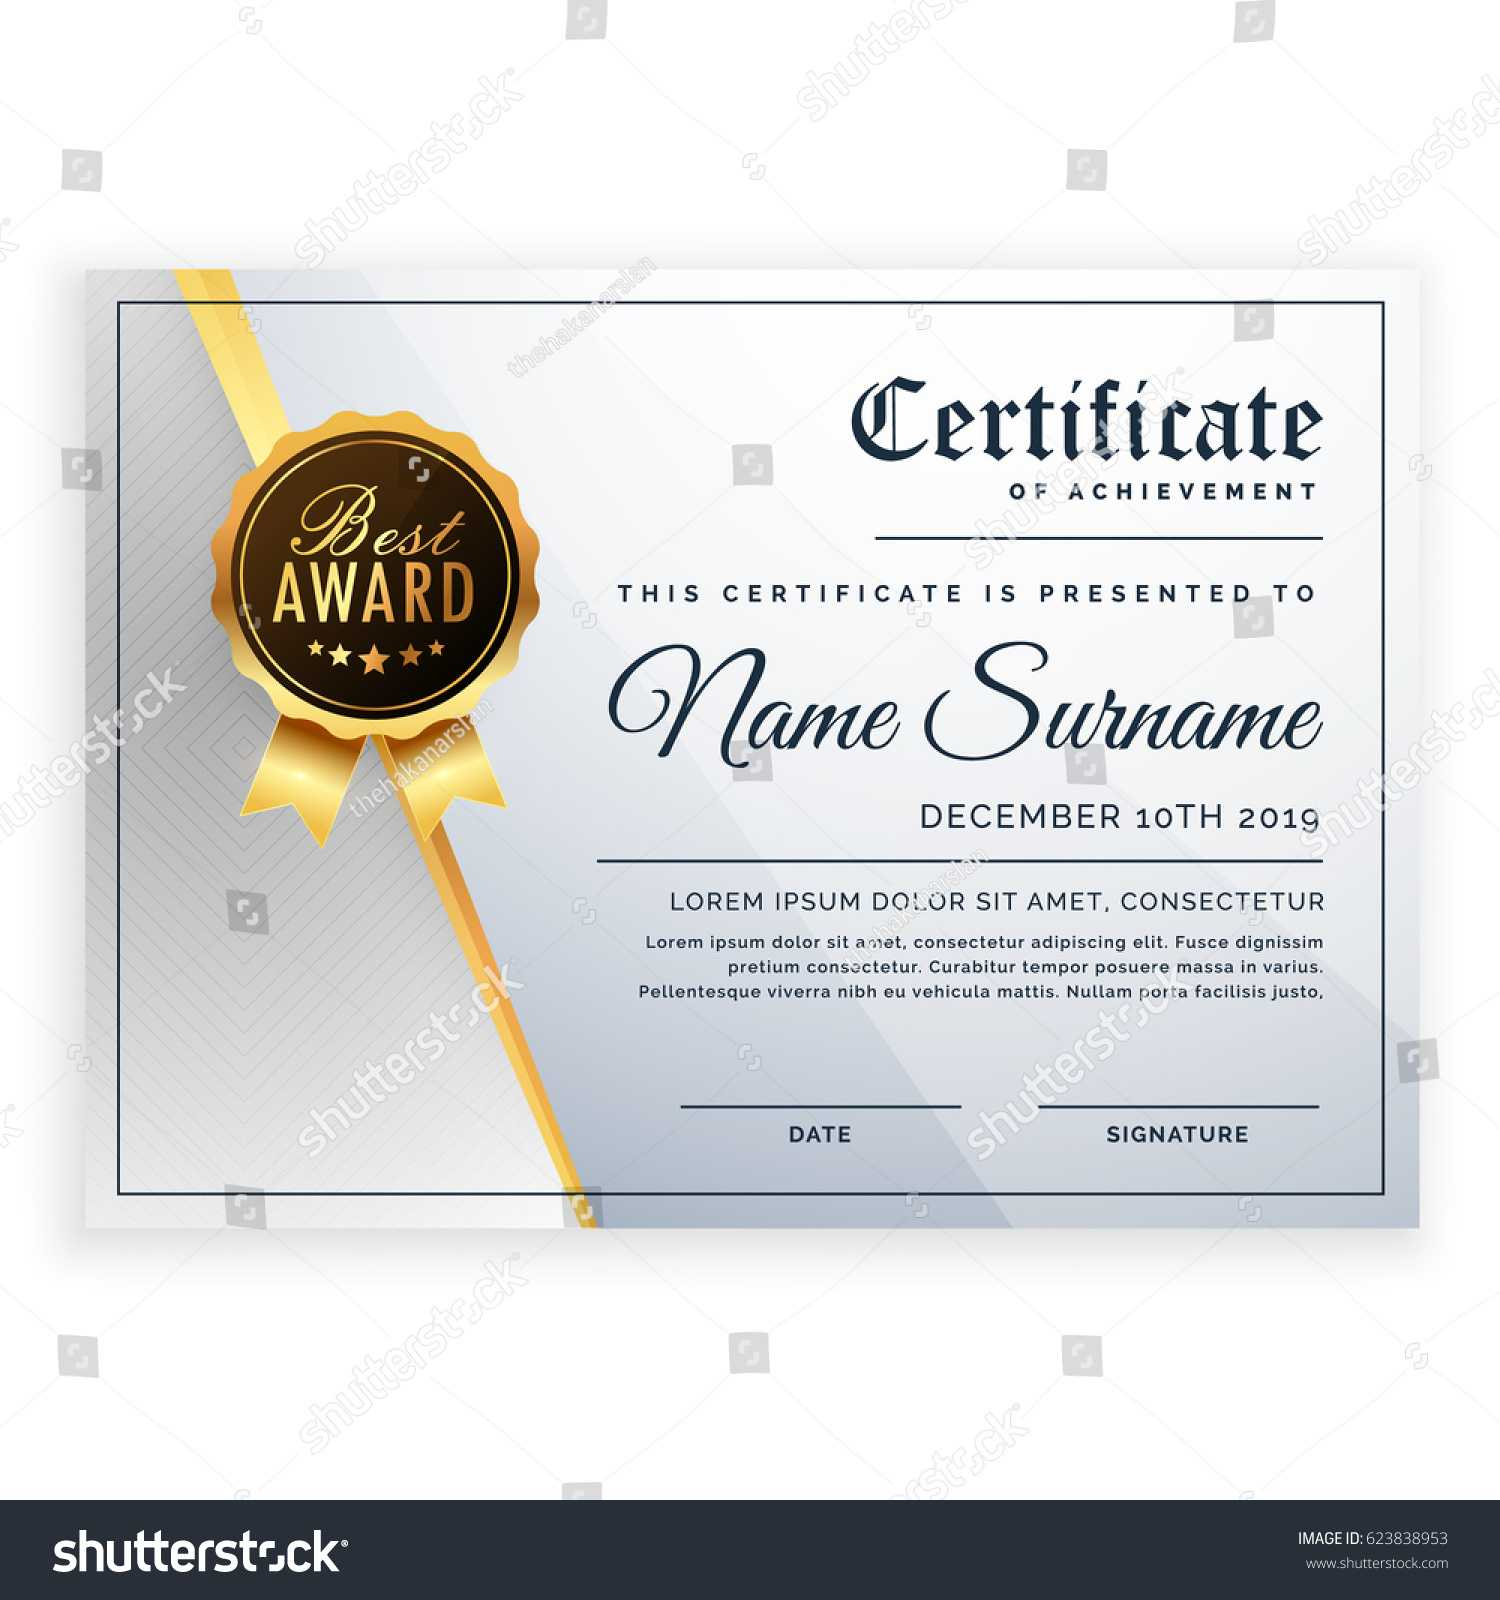 Vector Certificate Template Beautiful Certificate Template Throughout Beautiful Certificate Templates